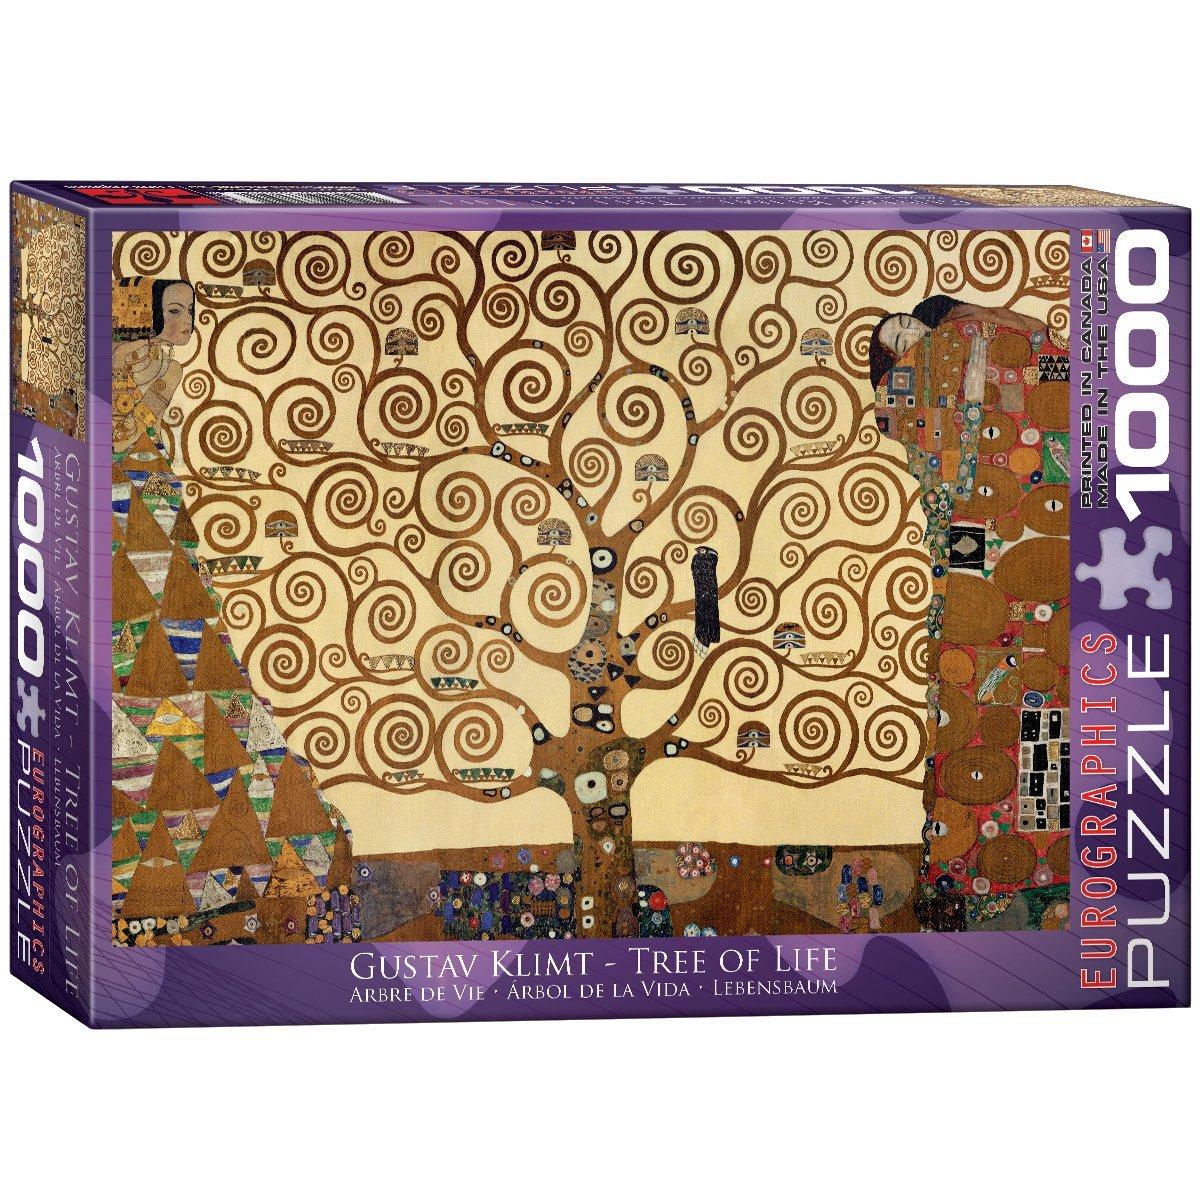 EuroGraphics Tree of Life by Gustav Klimt 1000-Piece Puzzle